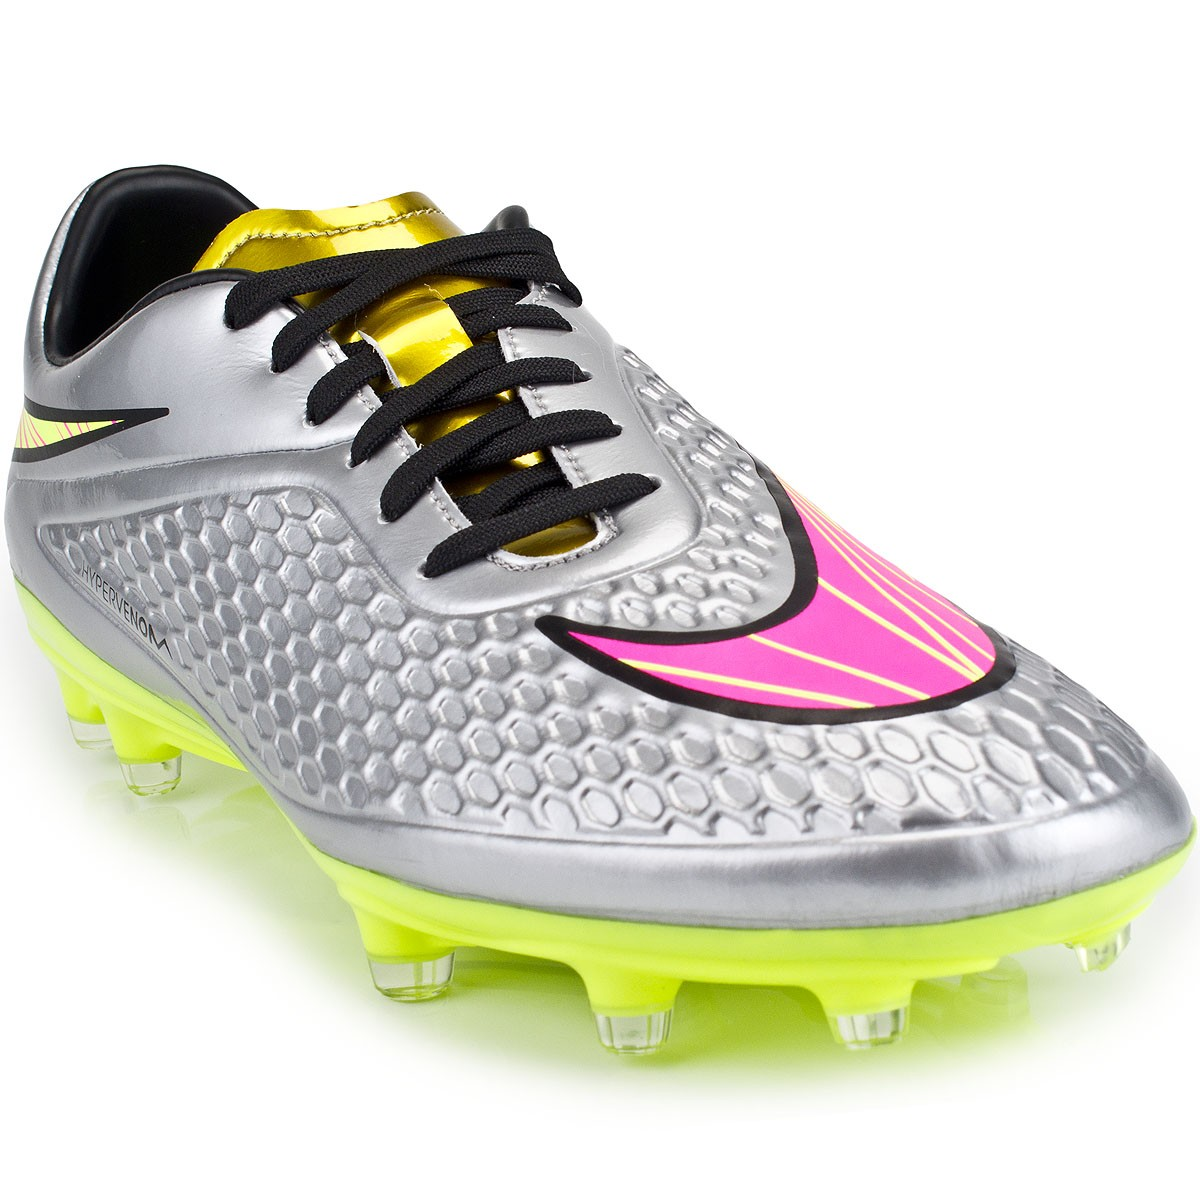 bac78ca94de91 Chuteira Nike Hypervenom Phelon Premium FG 677585